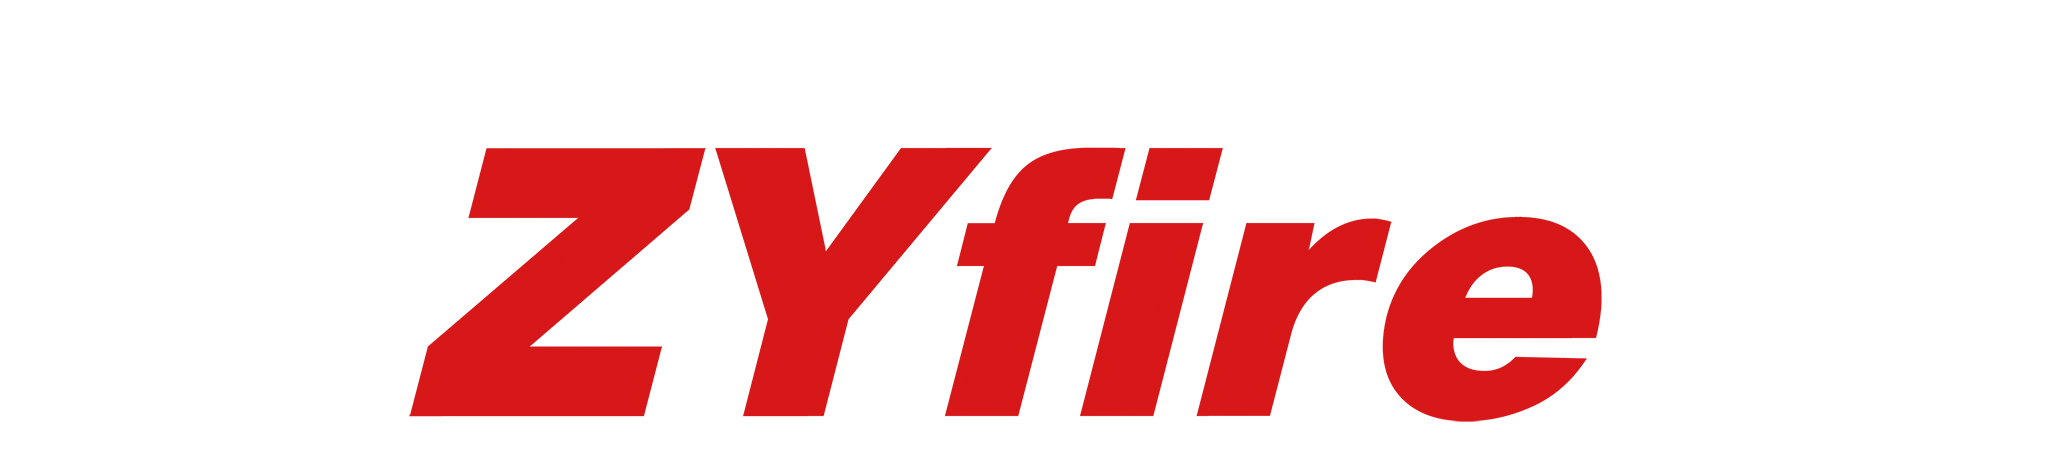 Corporación de mangueras ZYfire